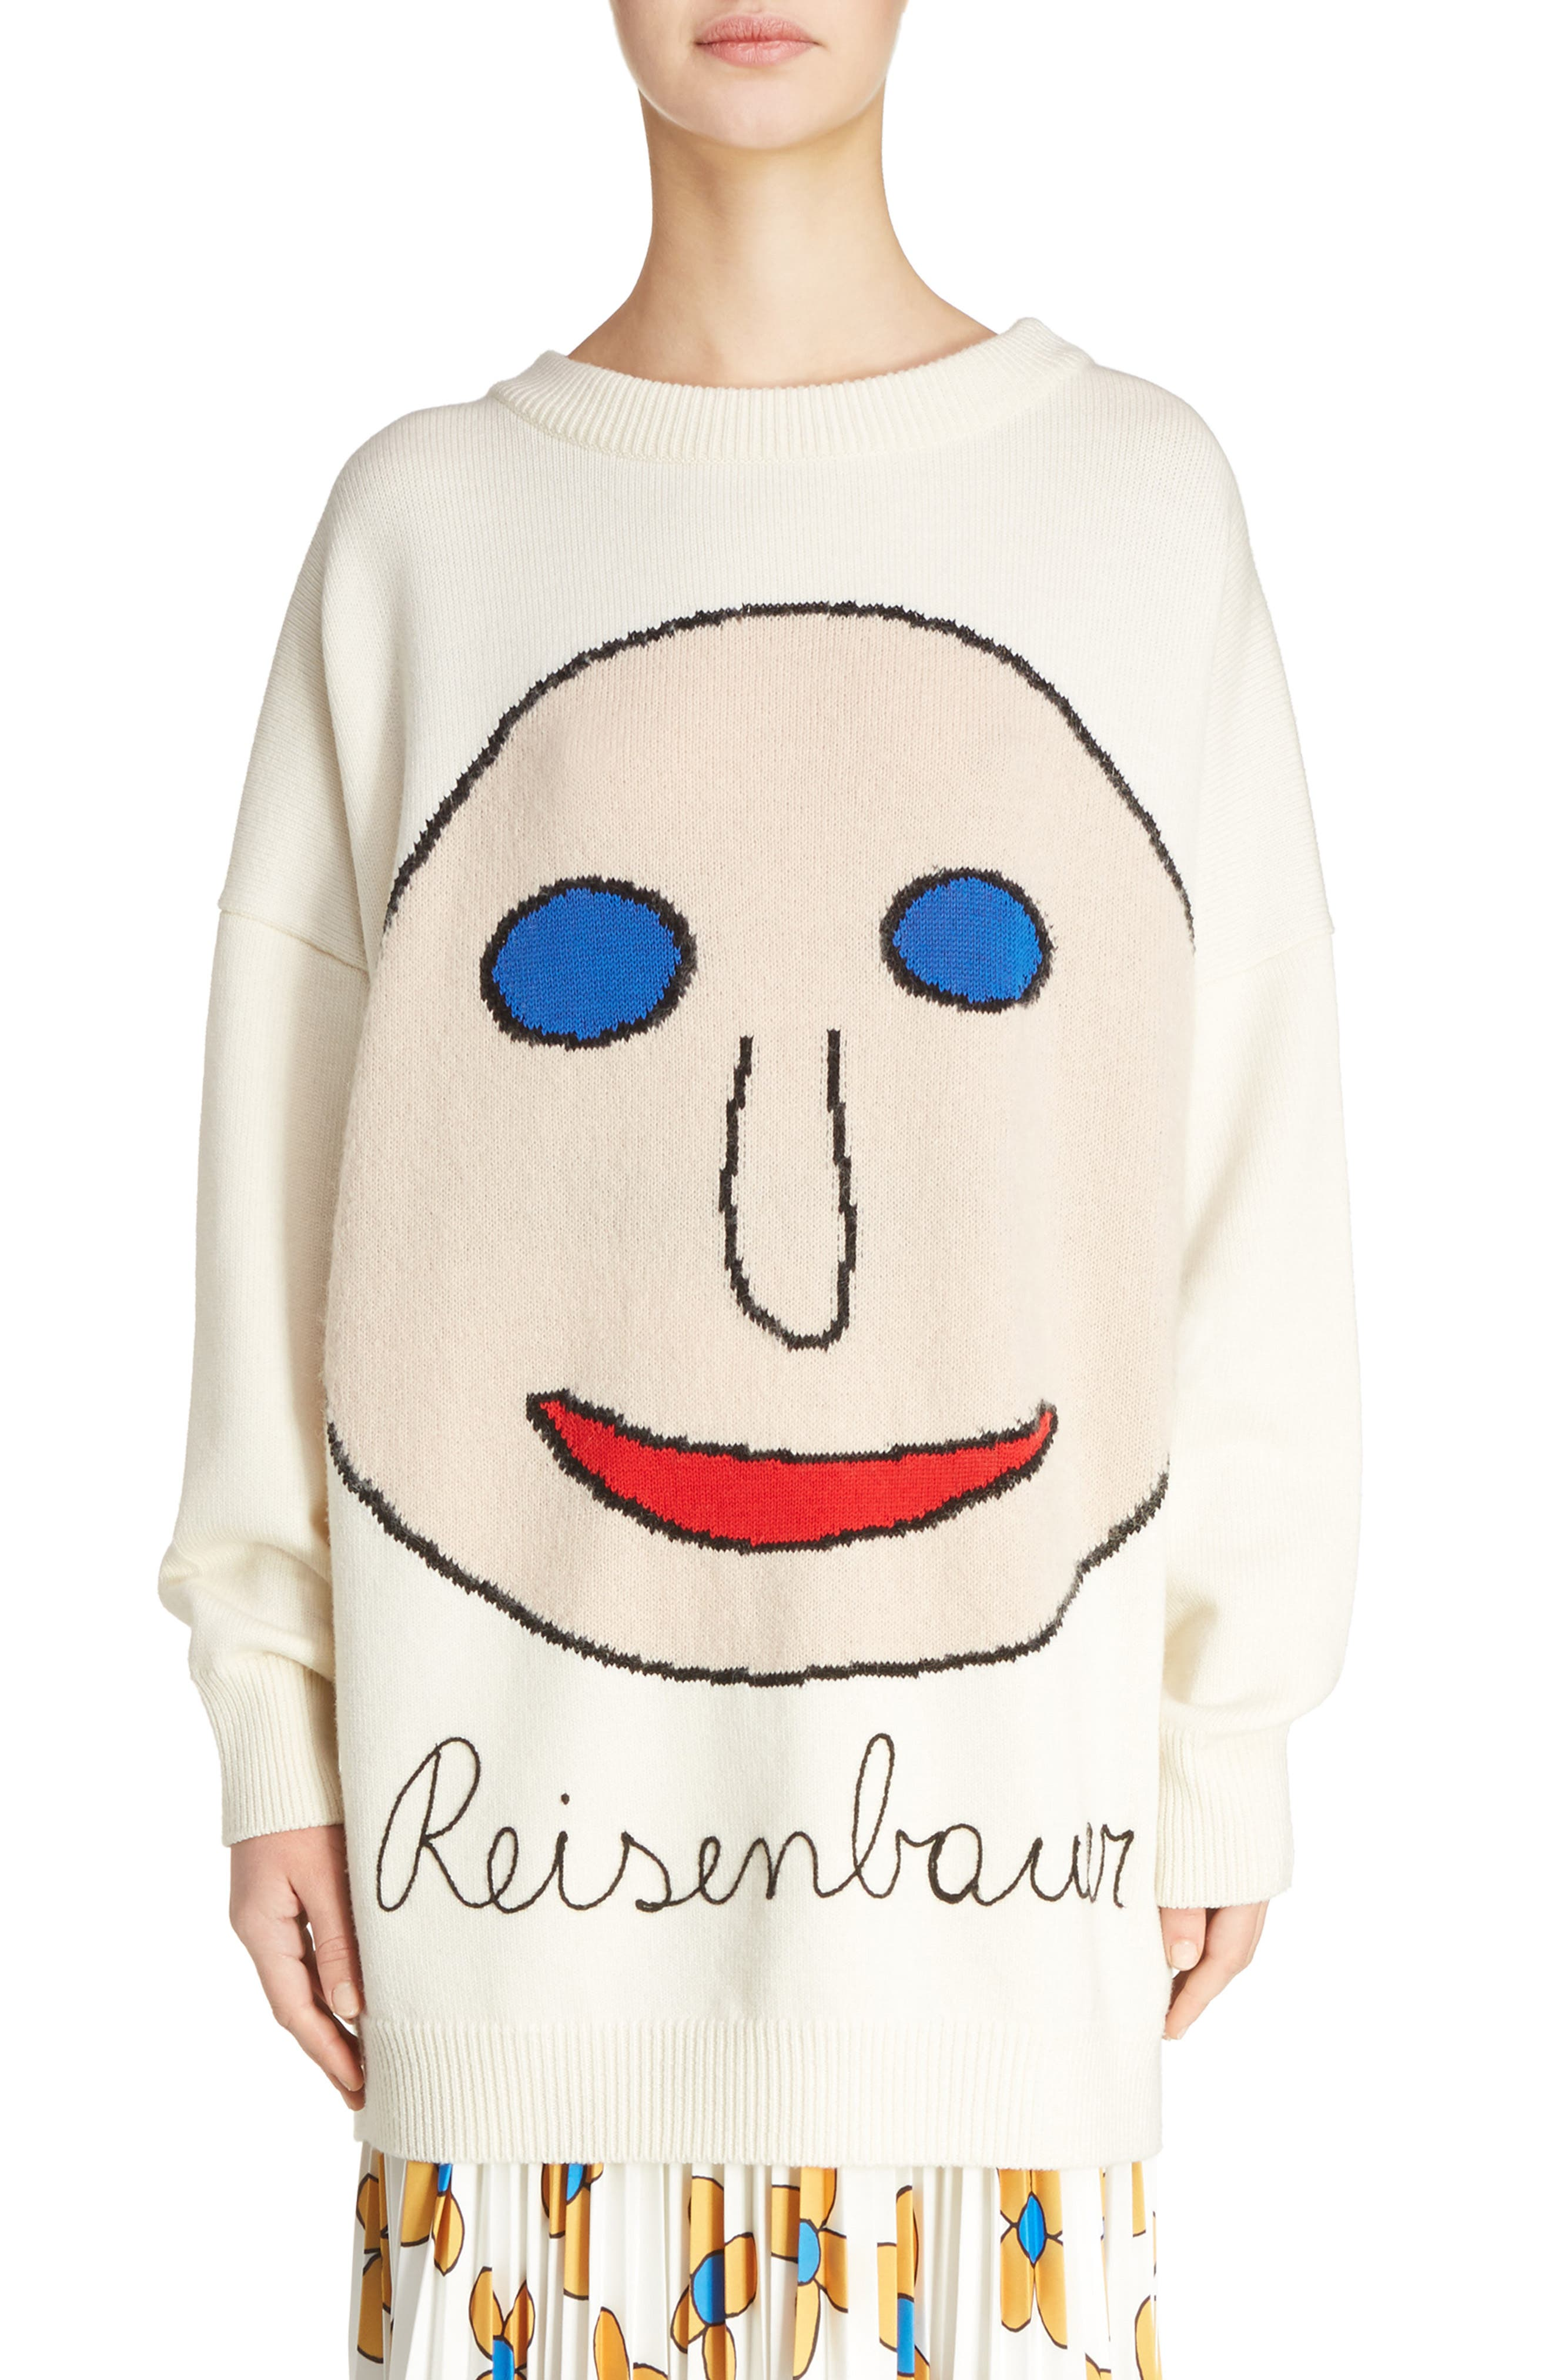 Main Image - Christopher Kane Reisenbauer Intarsia Face Sweater